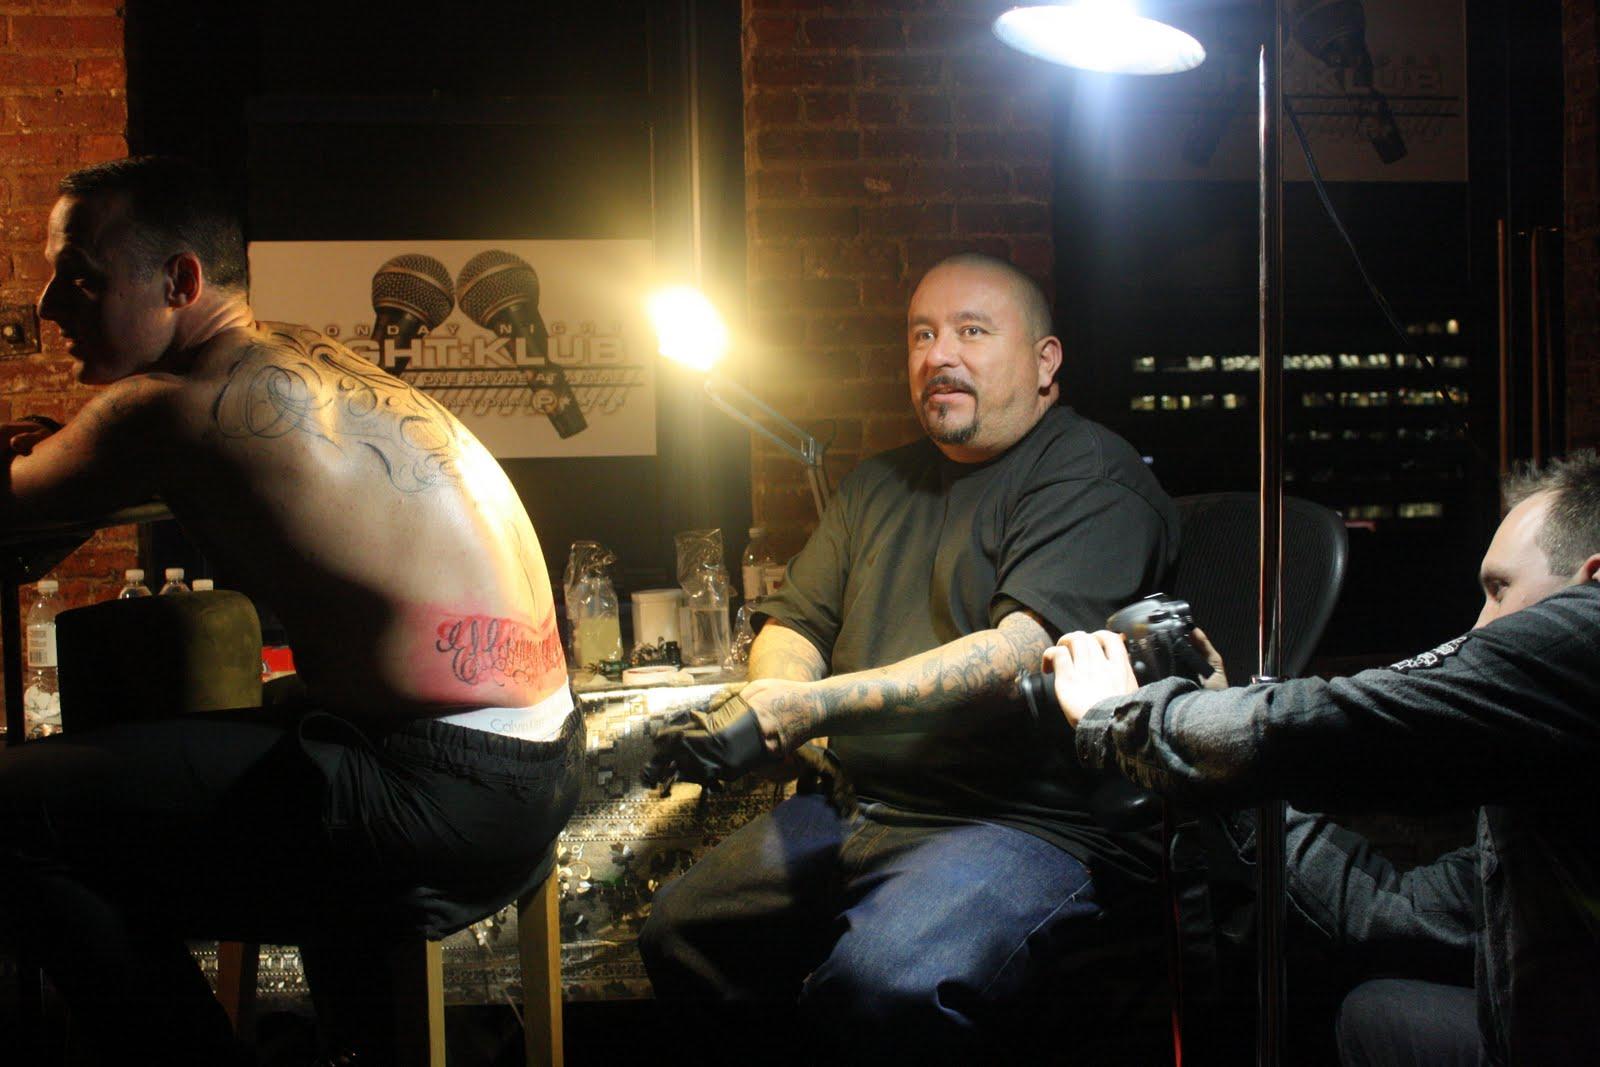 David Beckham's Tattoo On Her